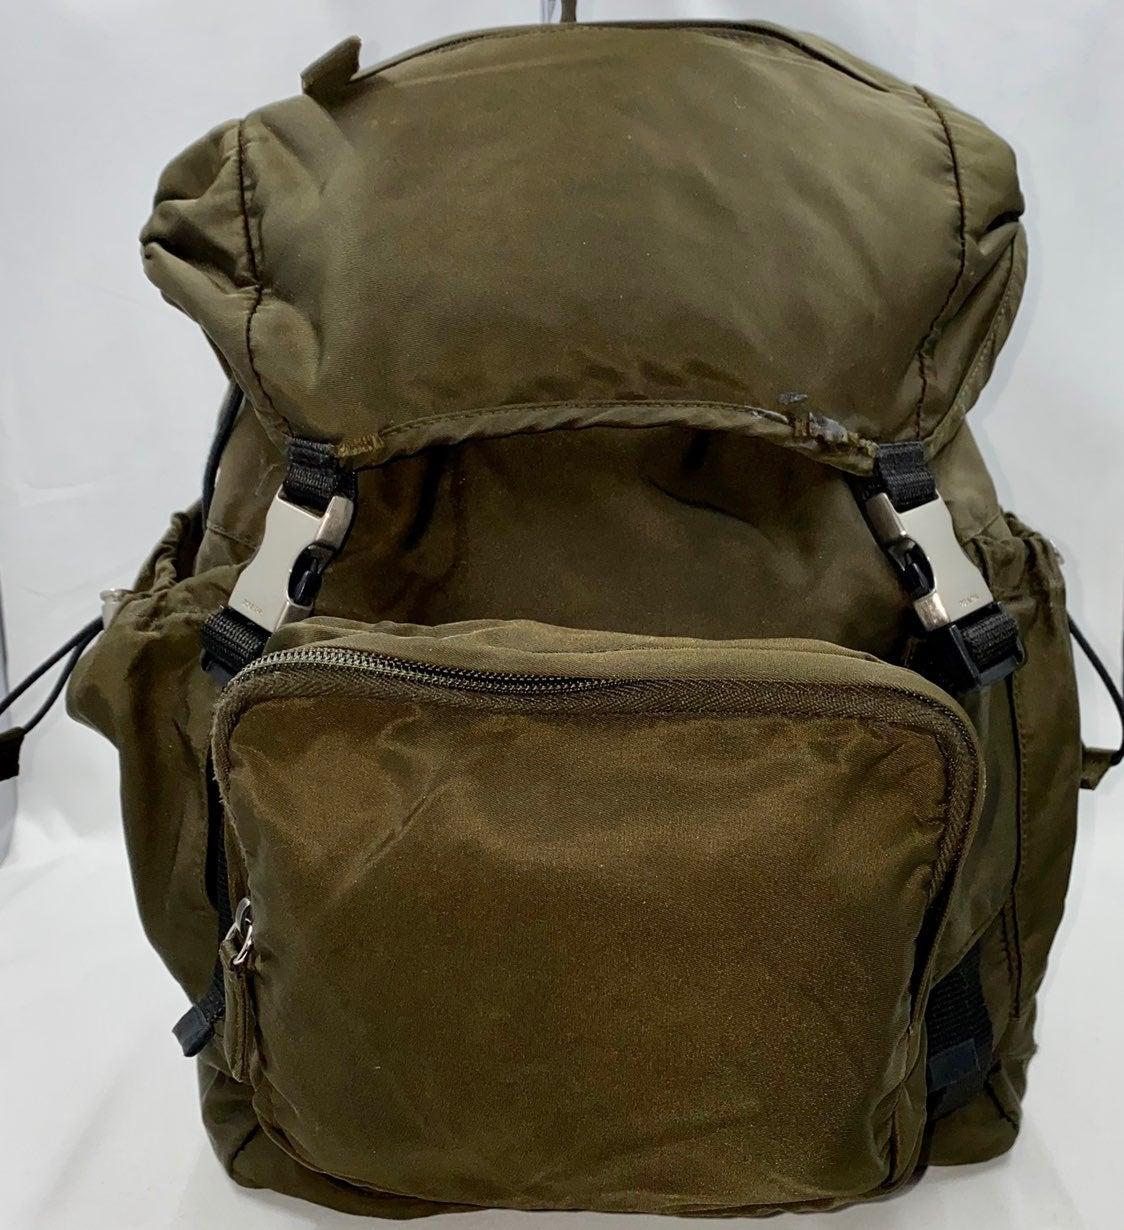 Prada Vela Backpack & Waist Band Combo